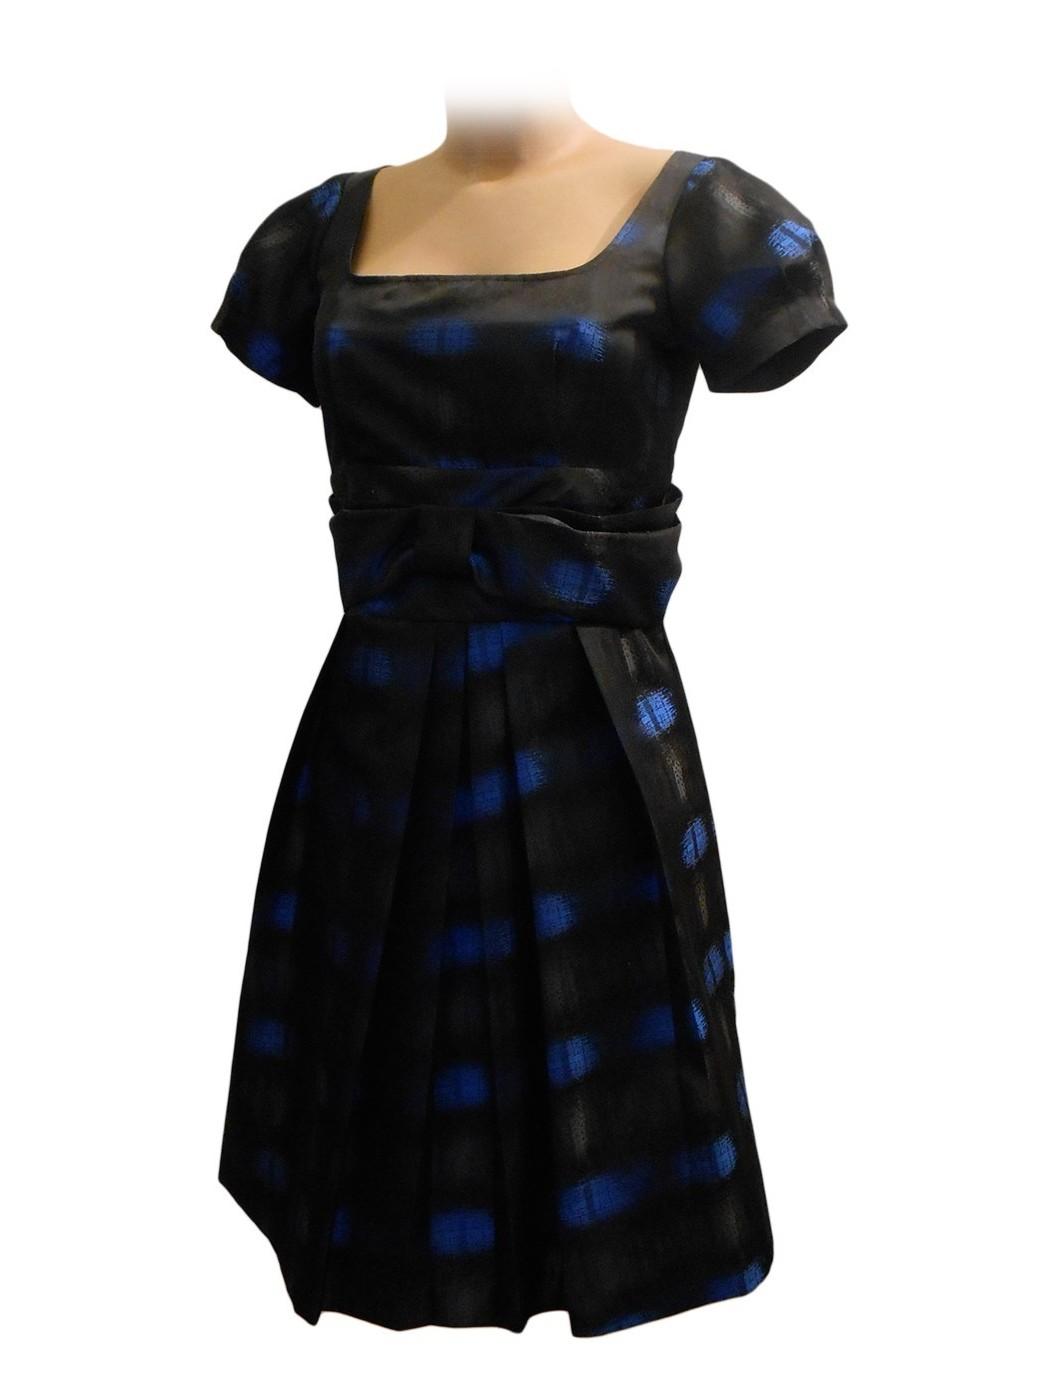 Kurtka Eddy B i sukienka.